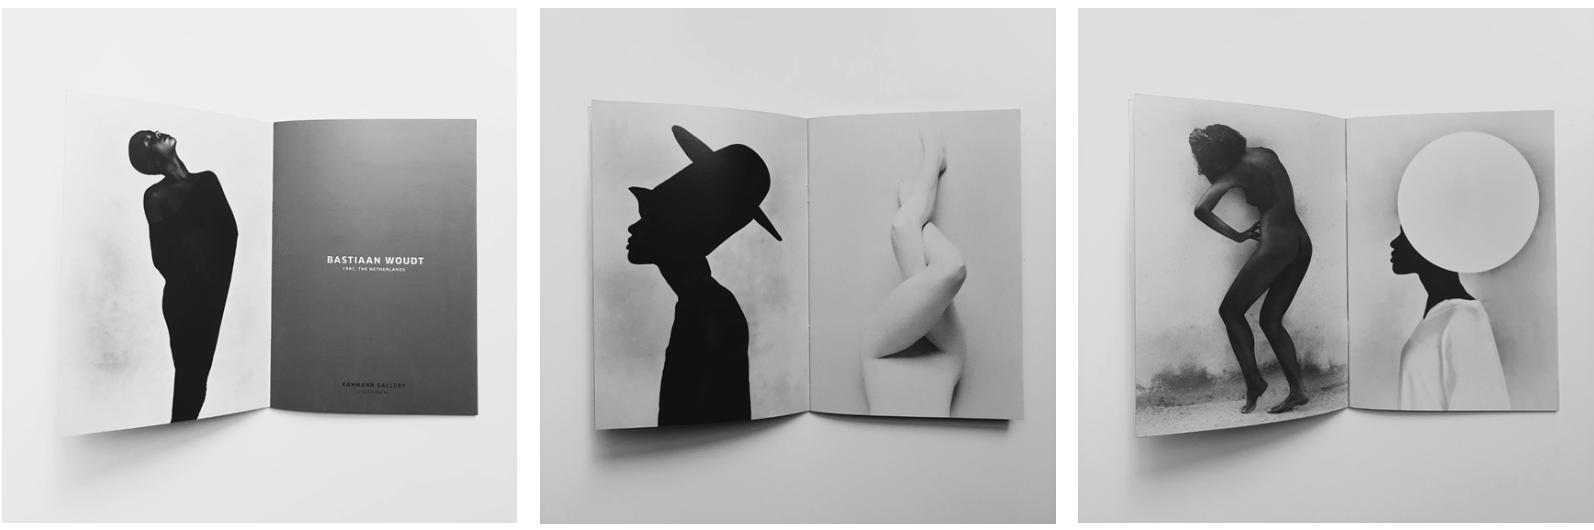 Bastiaan Woudt Catalog 2.png